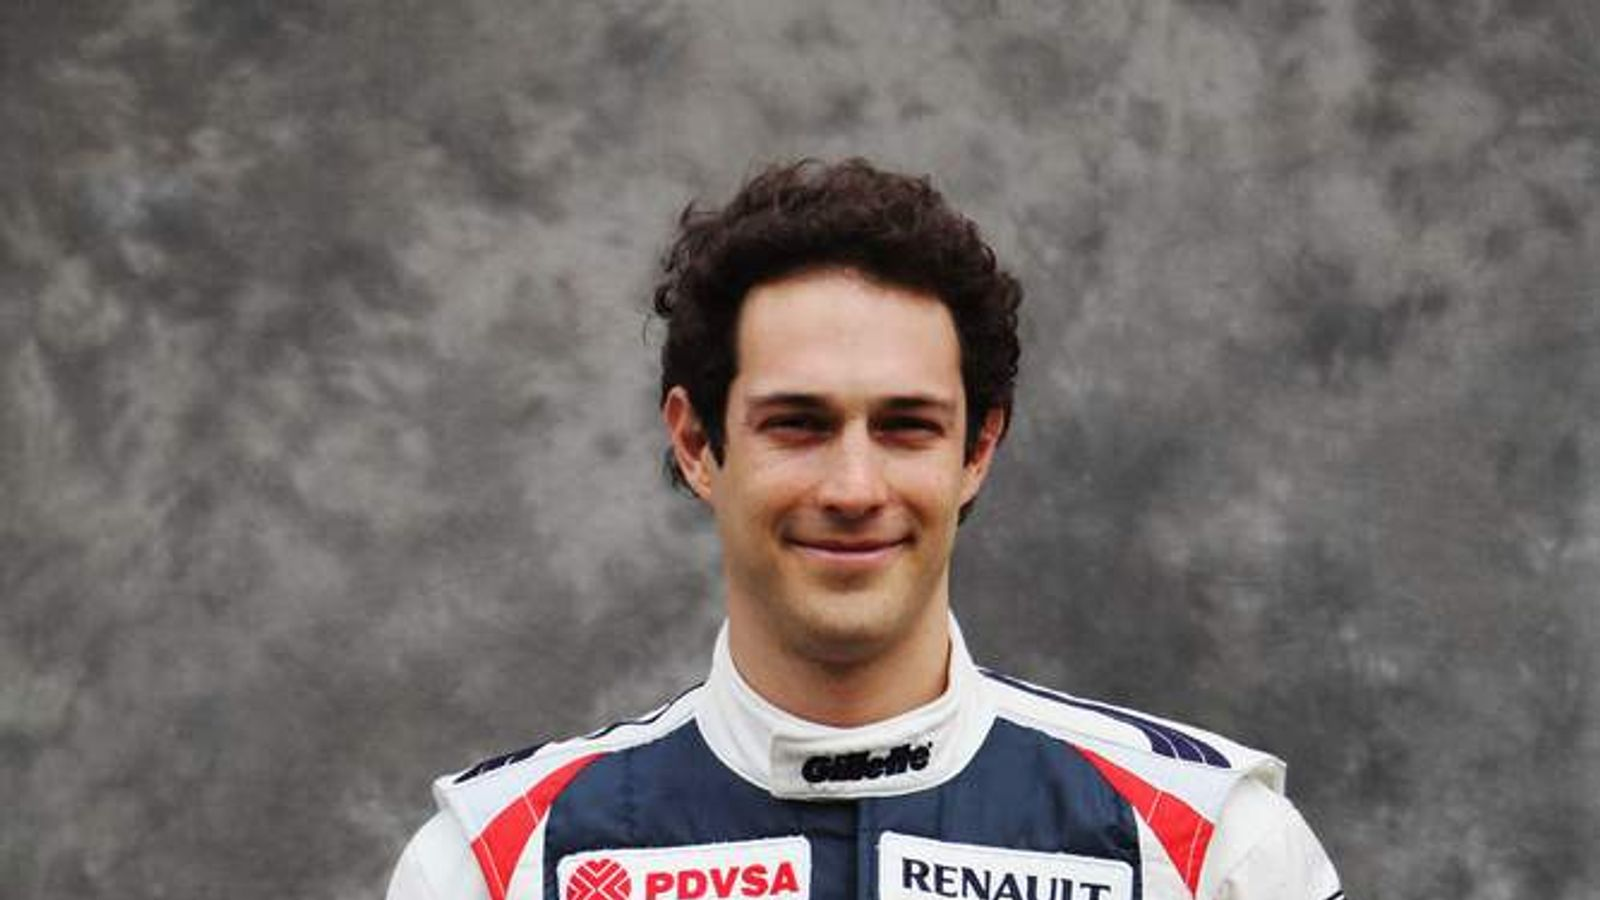 Bruno Senna of Brazil and Williams